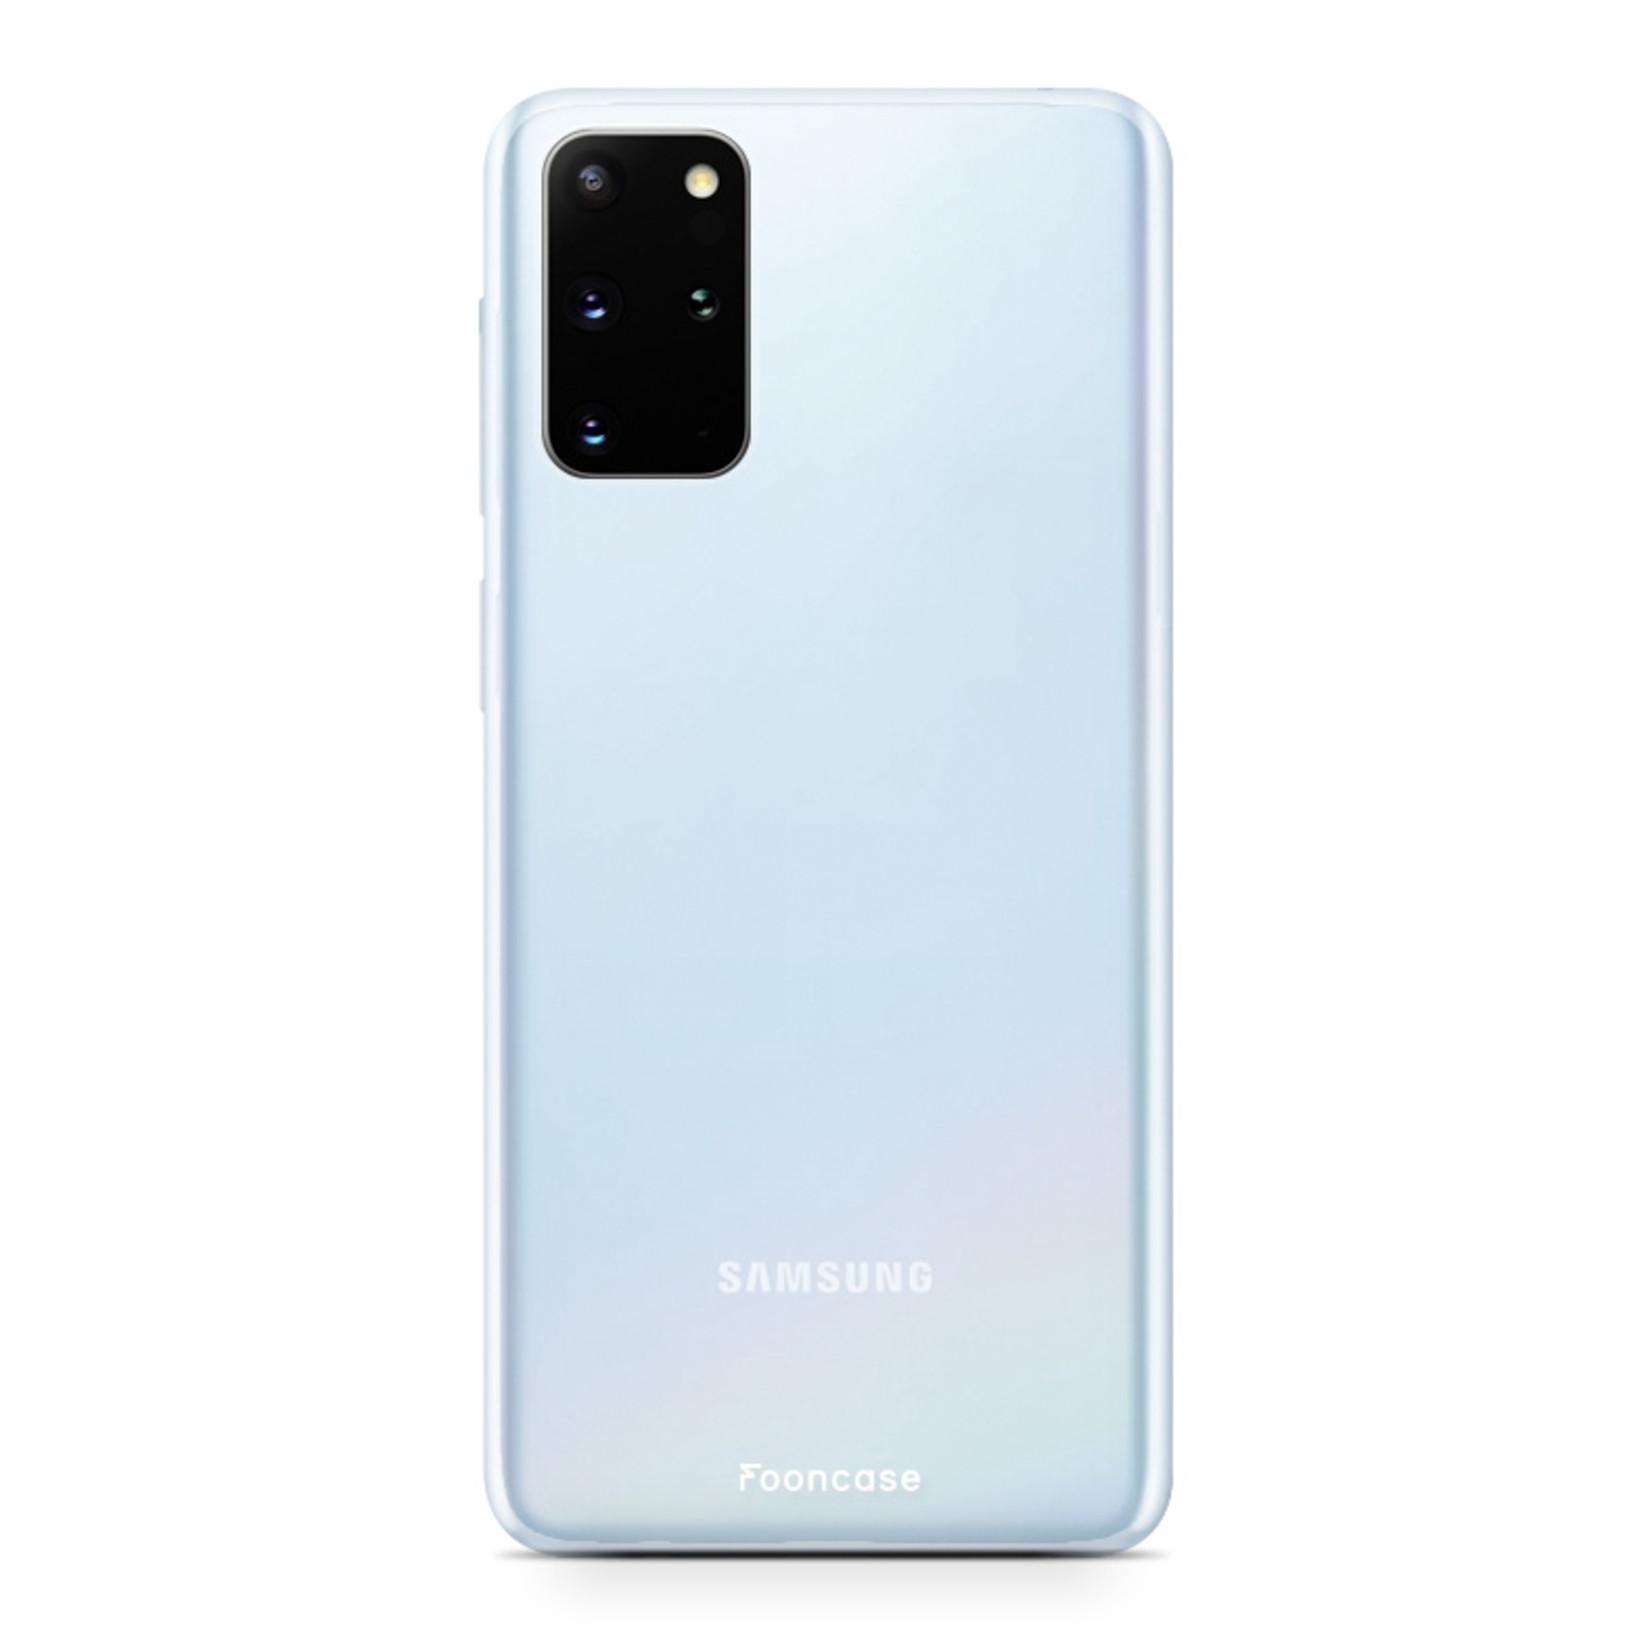 FOONCASE Samsung Galaxy S20 Plus hoesje TPU Soft Case - Back Cover - Transparant / Doorzichtig